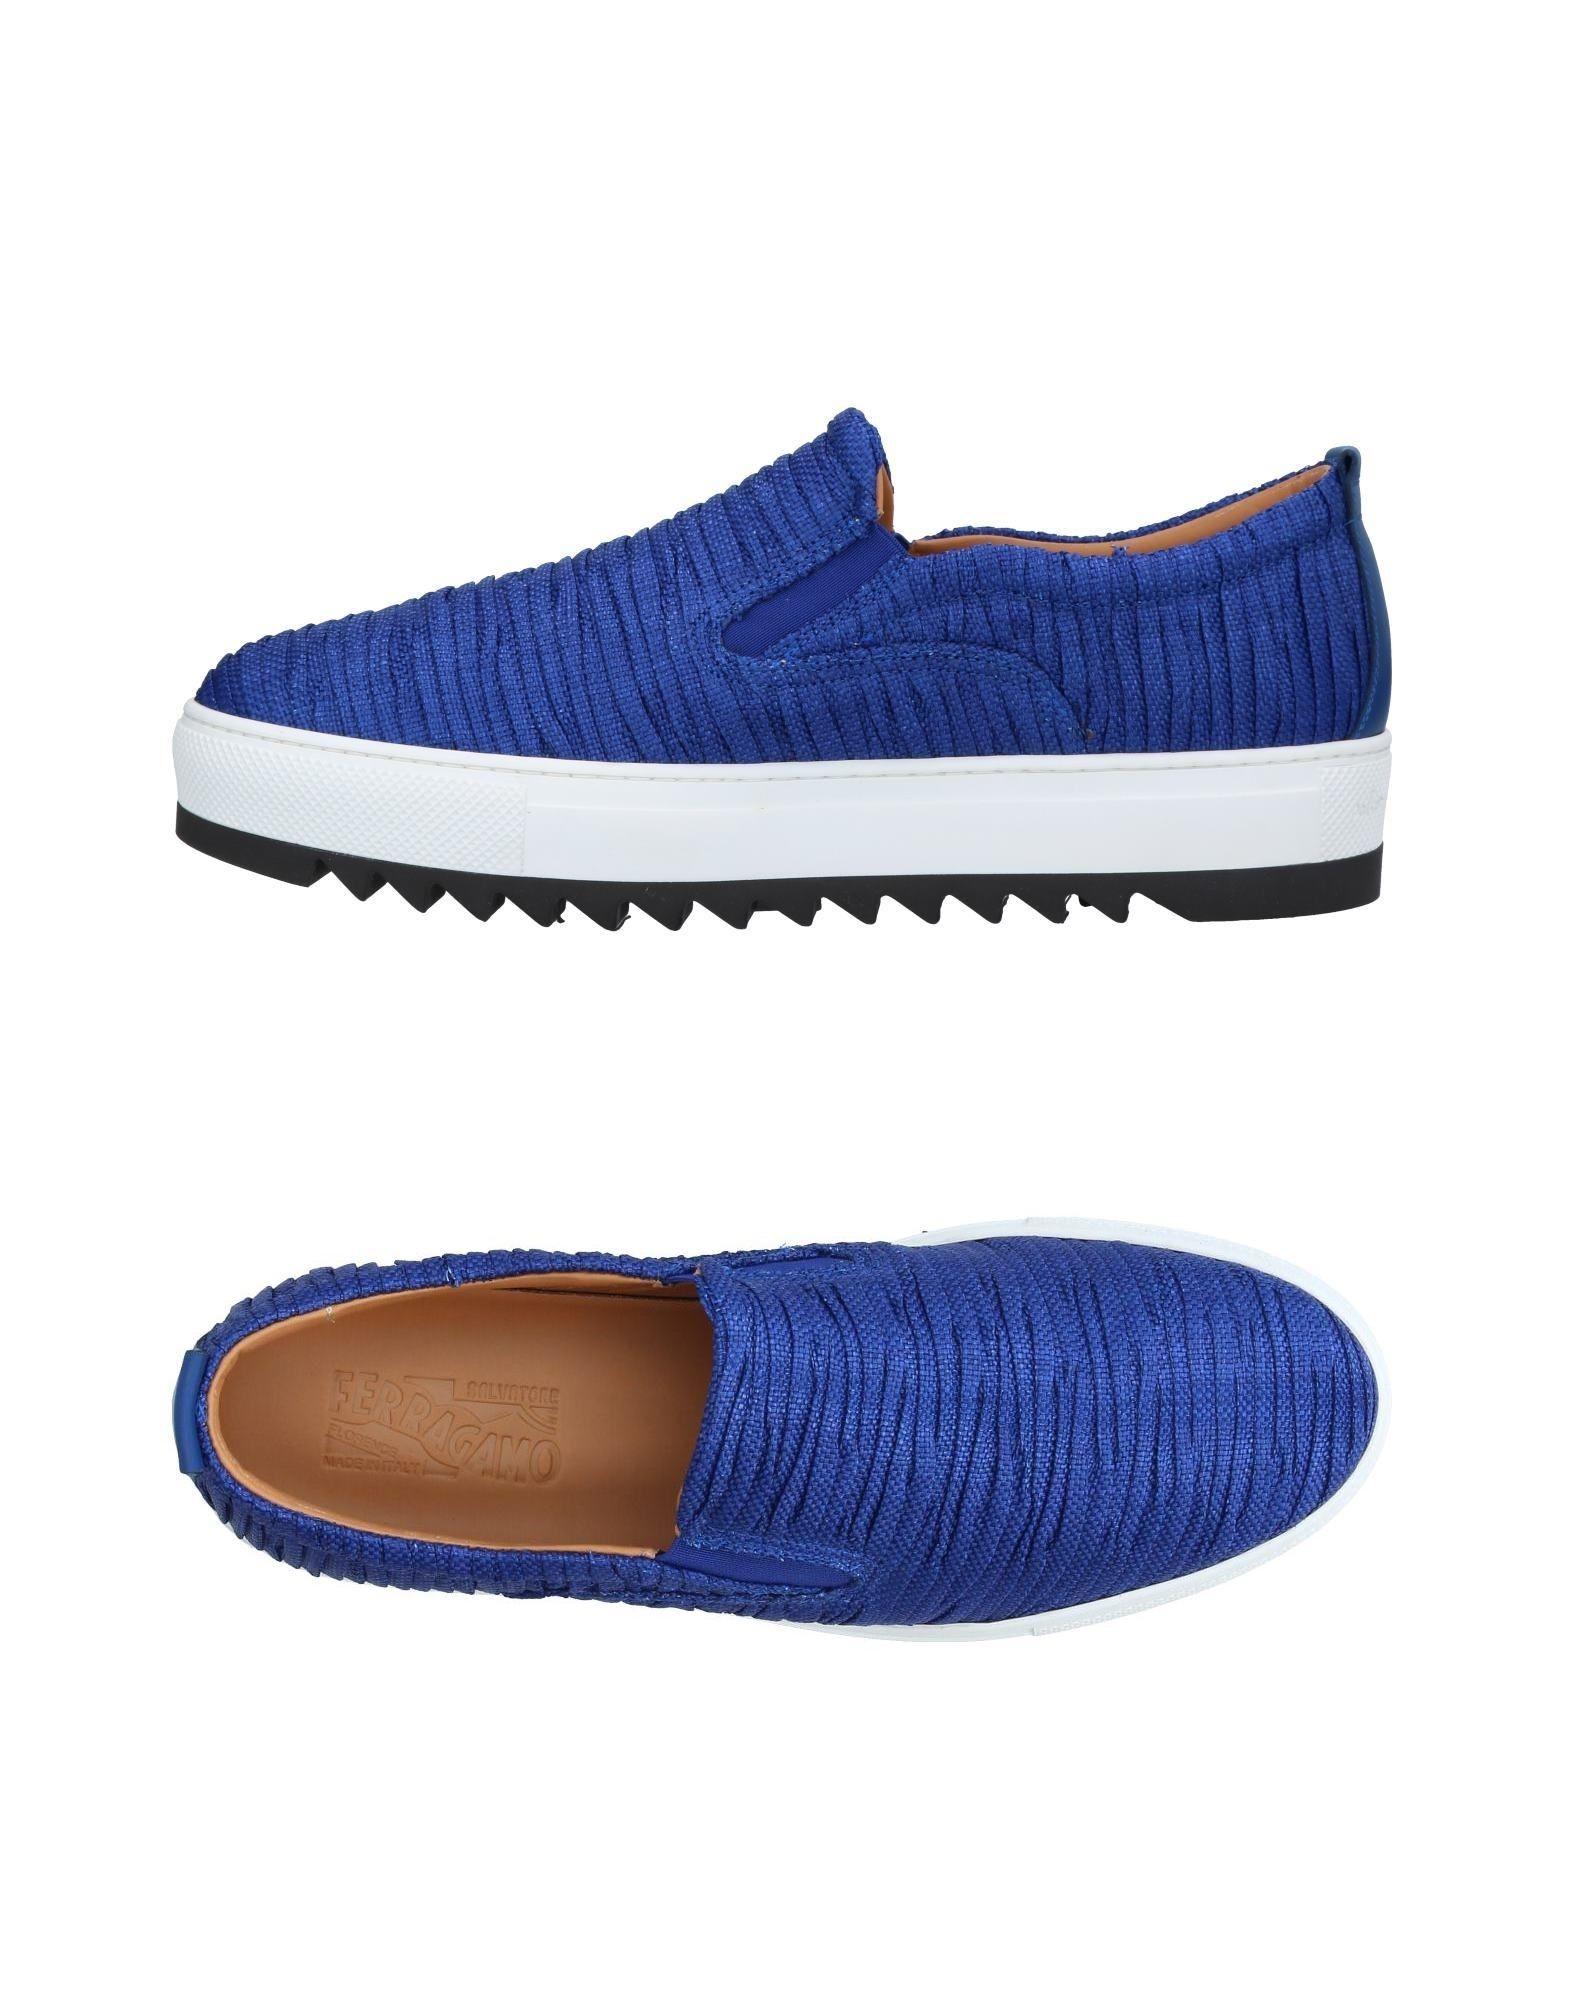 Salvatore Ferragamo Sneakers Herren  11397888MU Gute Qualität beliebte Schuhe